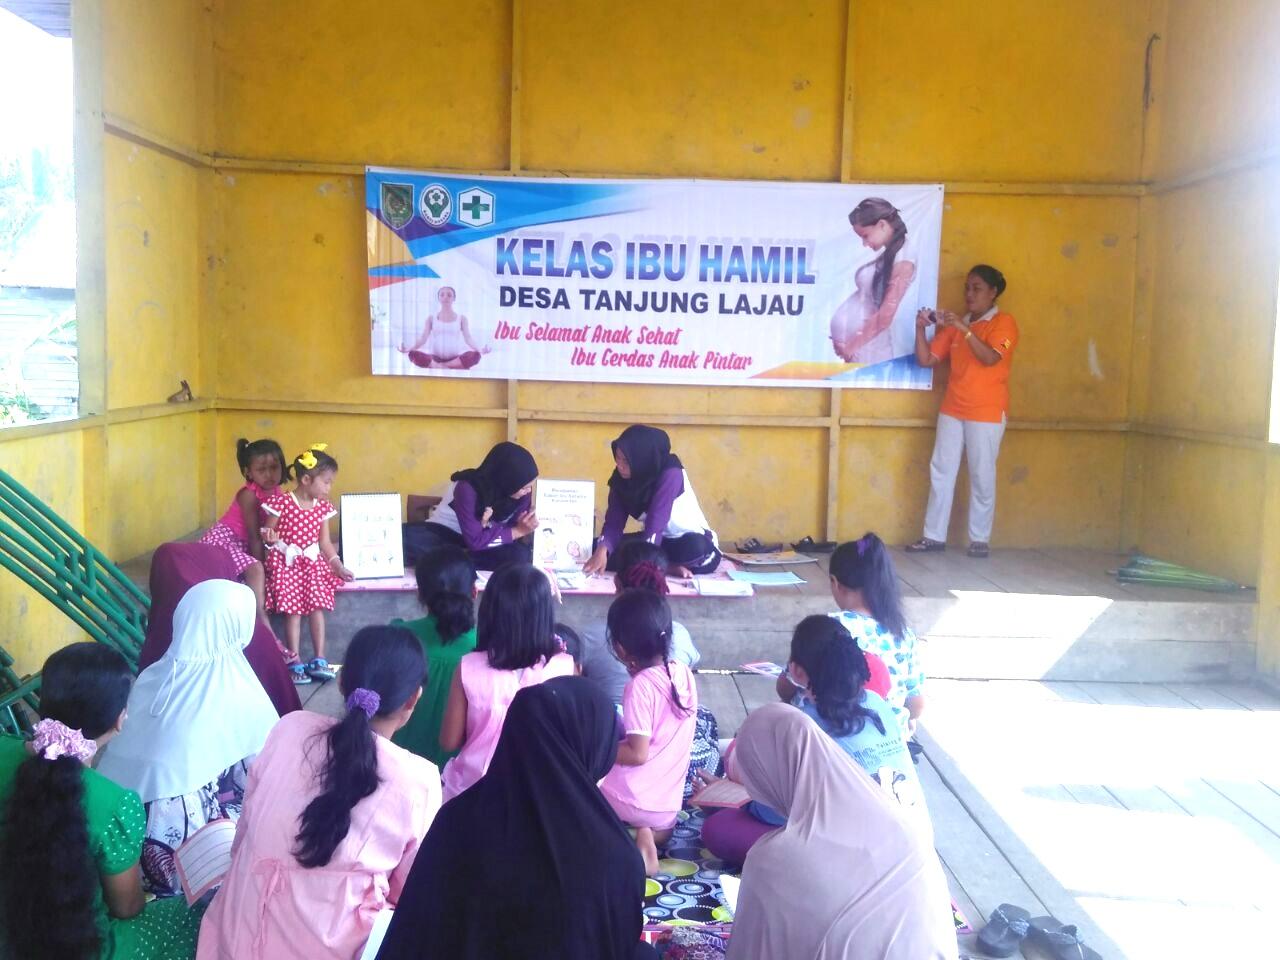 Ibu-ibu Hamil di Desa Tanjung Lajau, Kuindra Dapat Penyuluhan